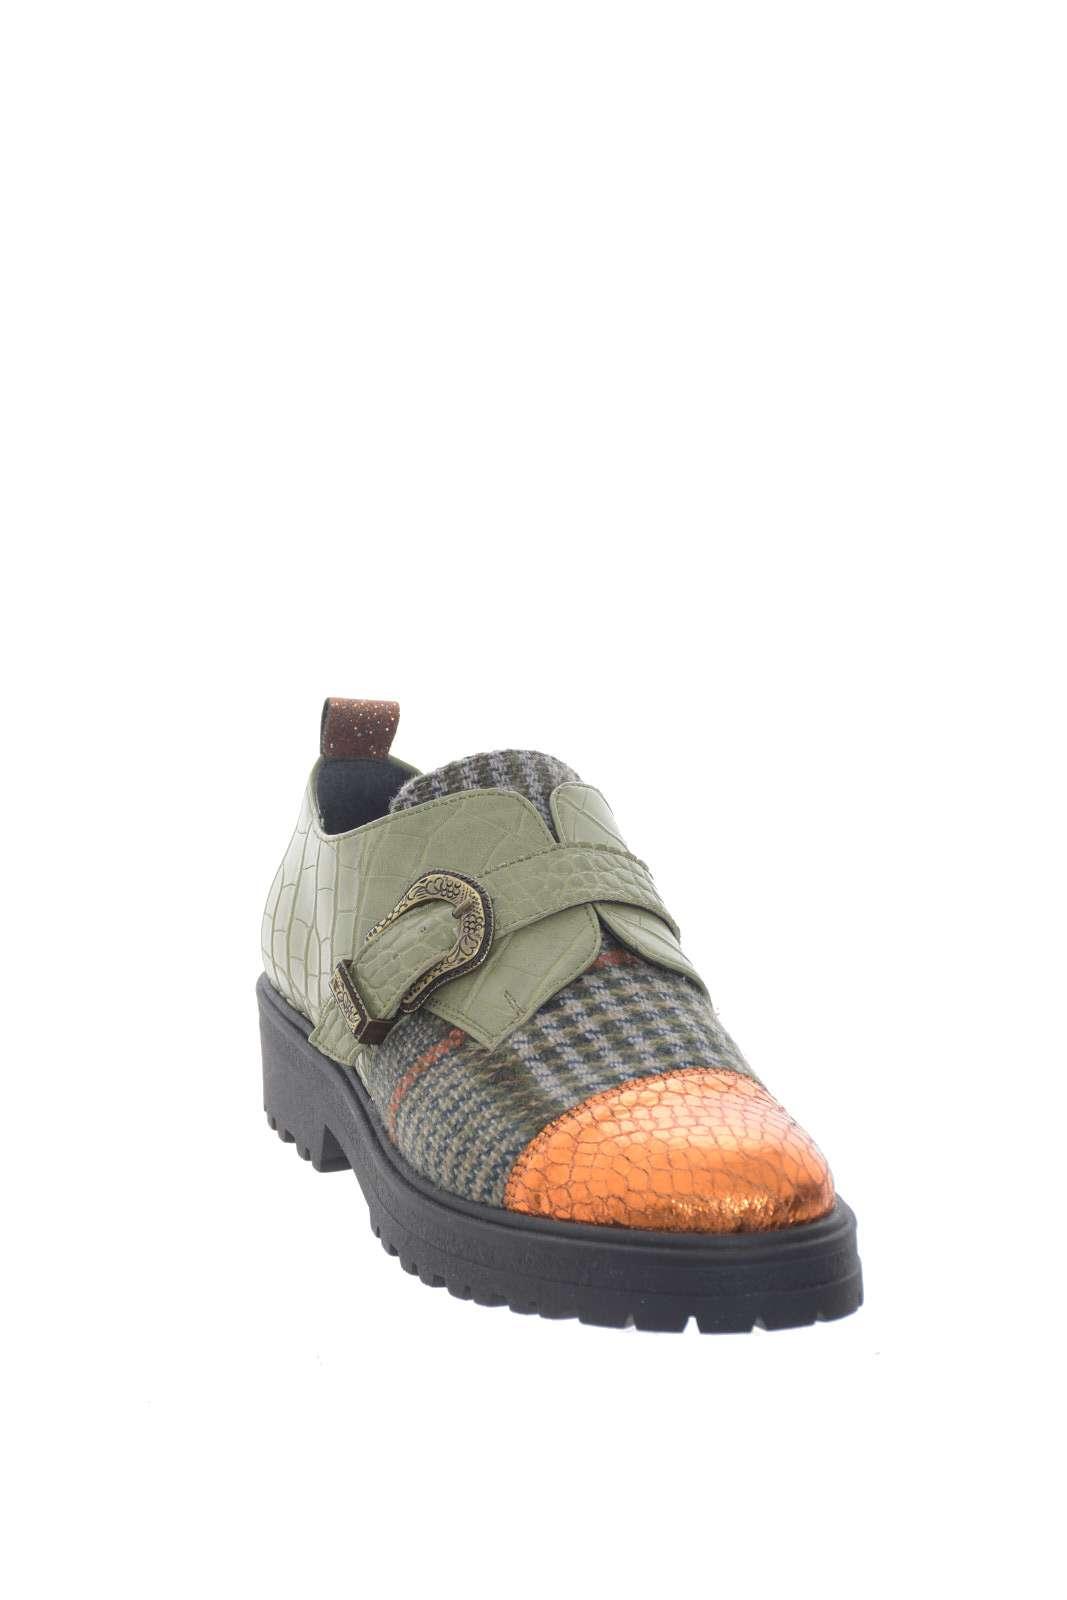 https://www.parmax.com/media/catalog/product/a/i/AI-outlet_parmax-scarpe-donna-Kontessa-F192403-B.jpg